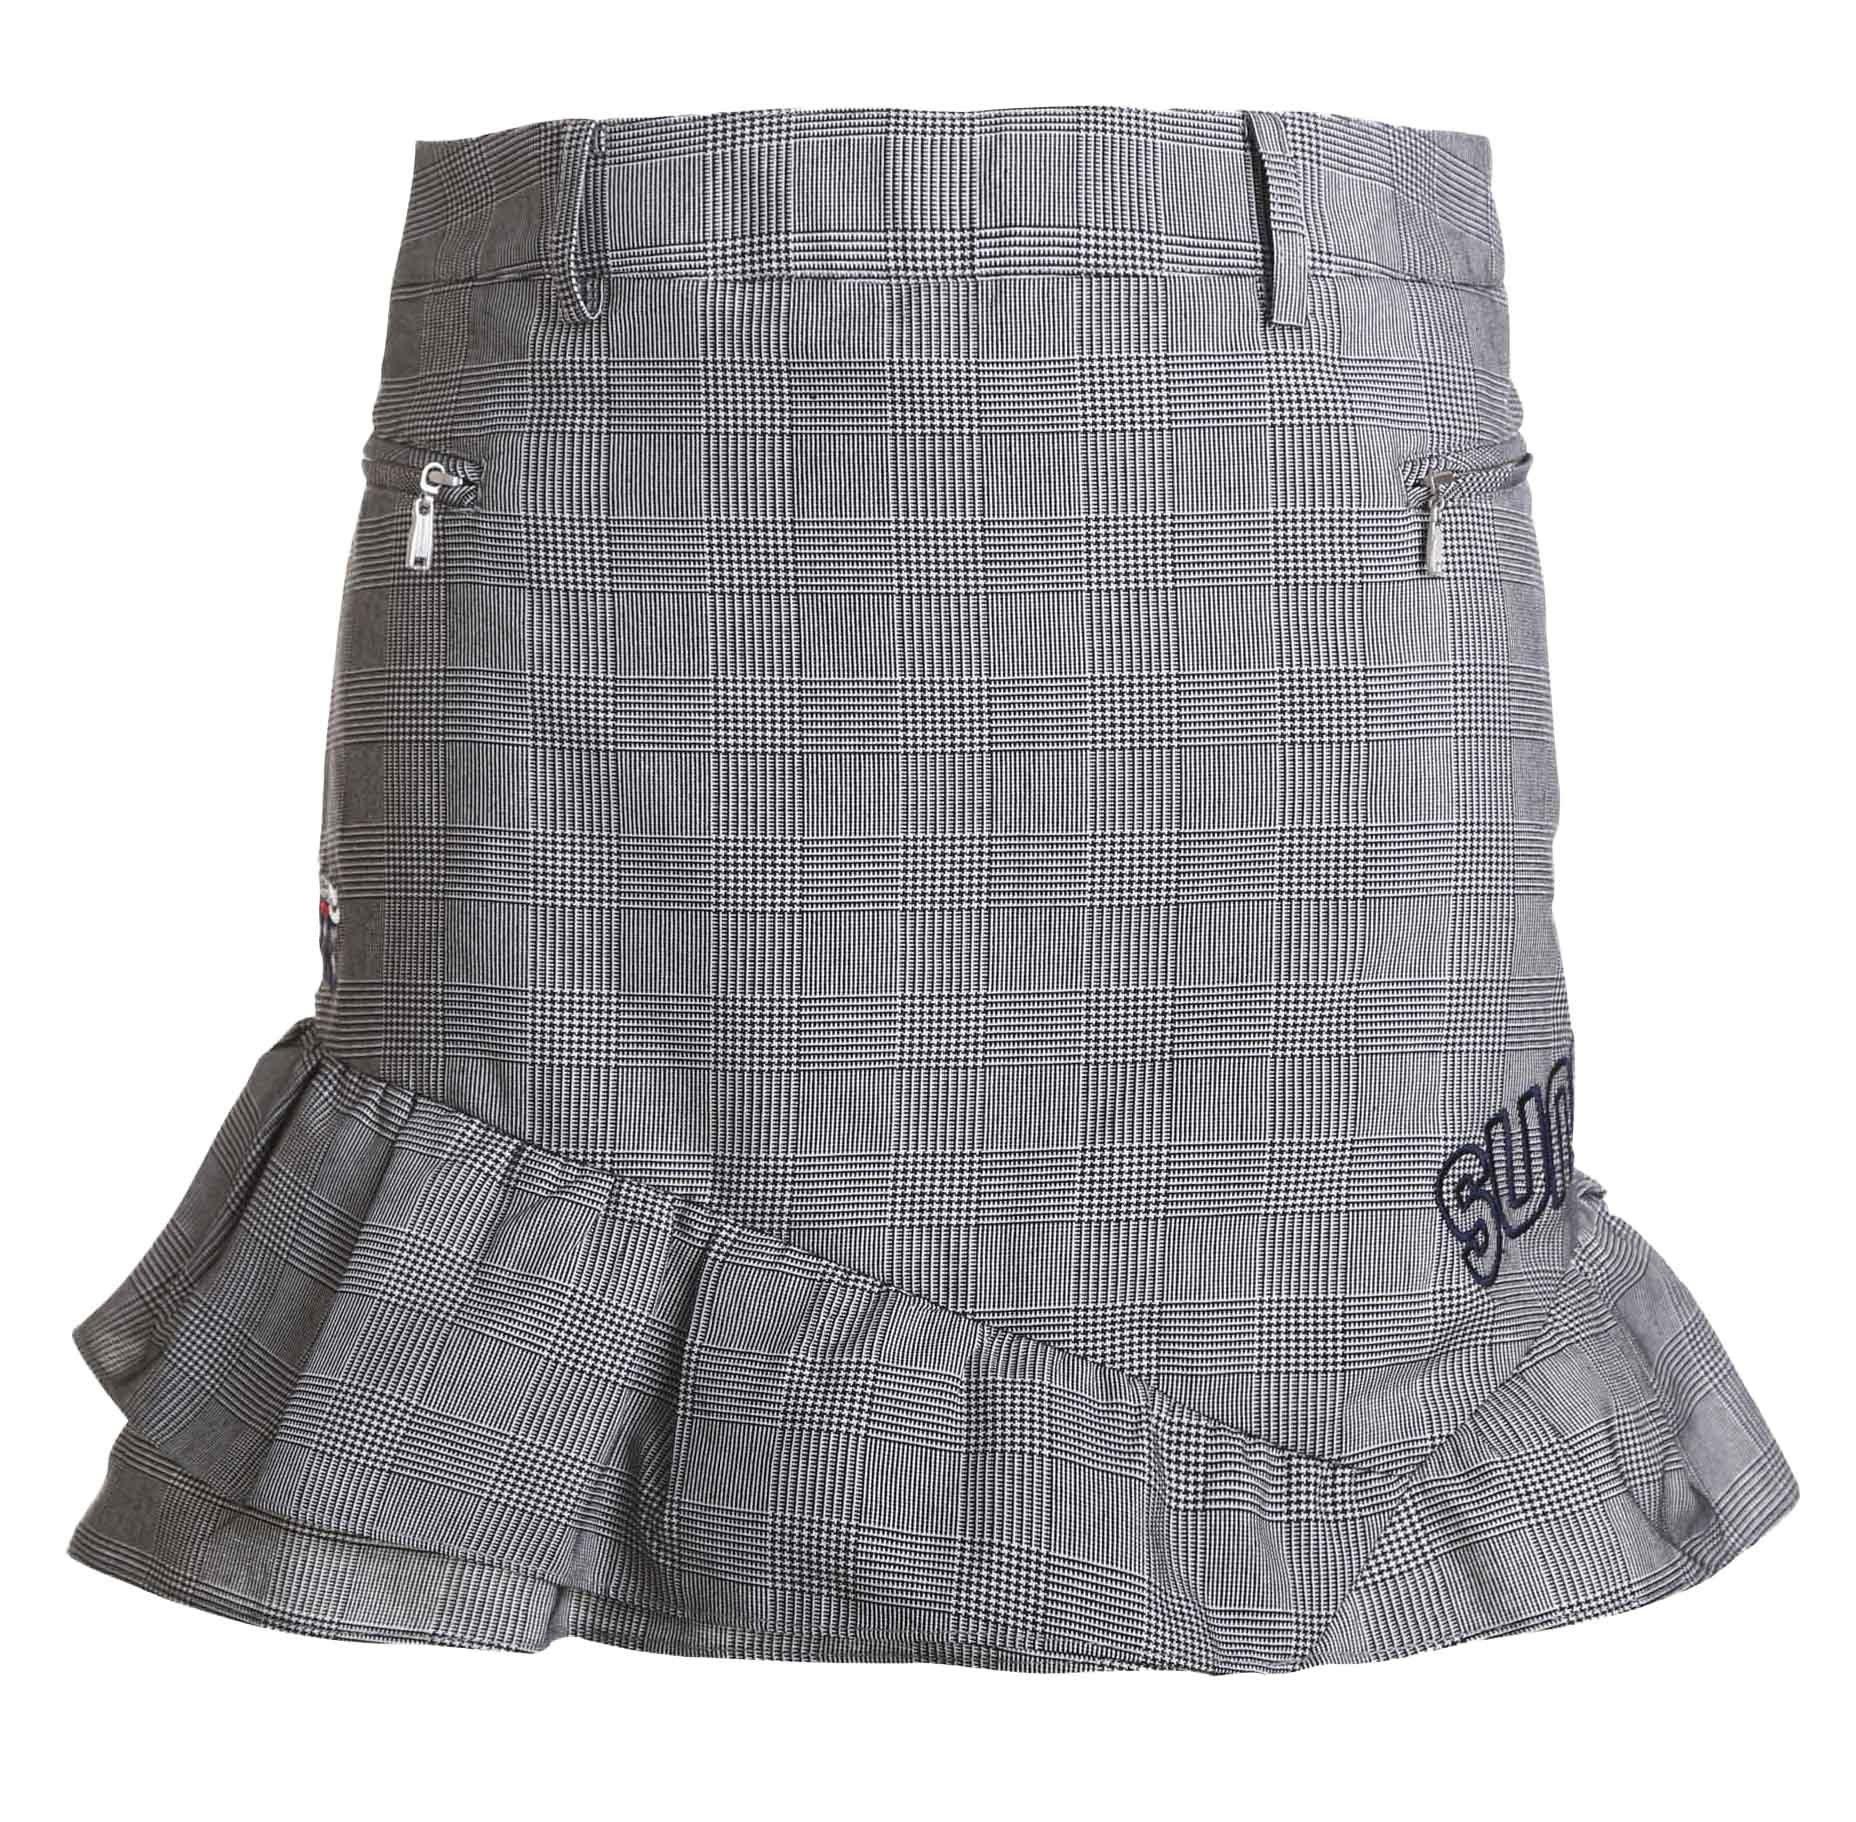 SVG Women's Plaid Golf Skorts Falbala Hem Mini Casual Skirt Grey M